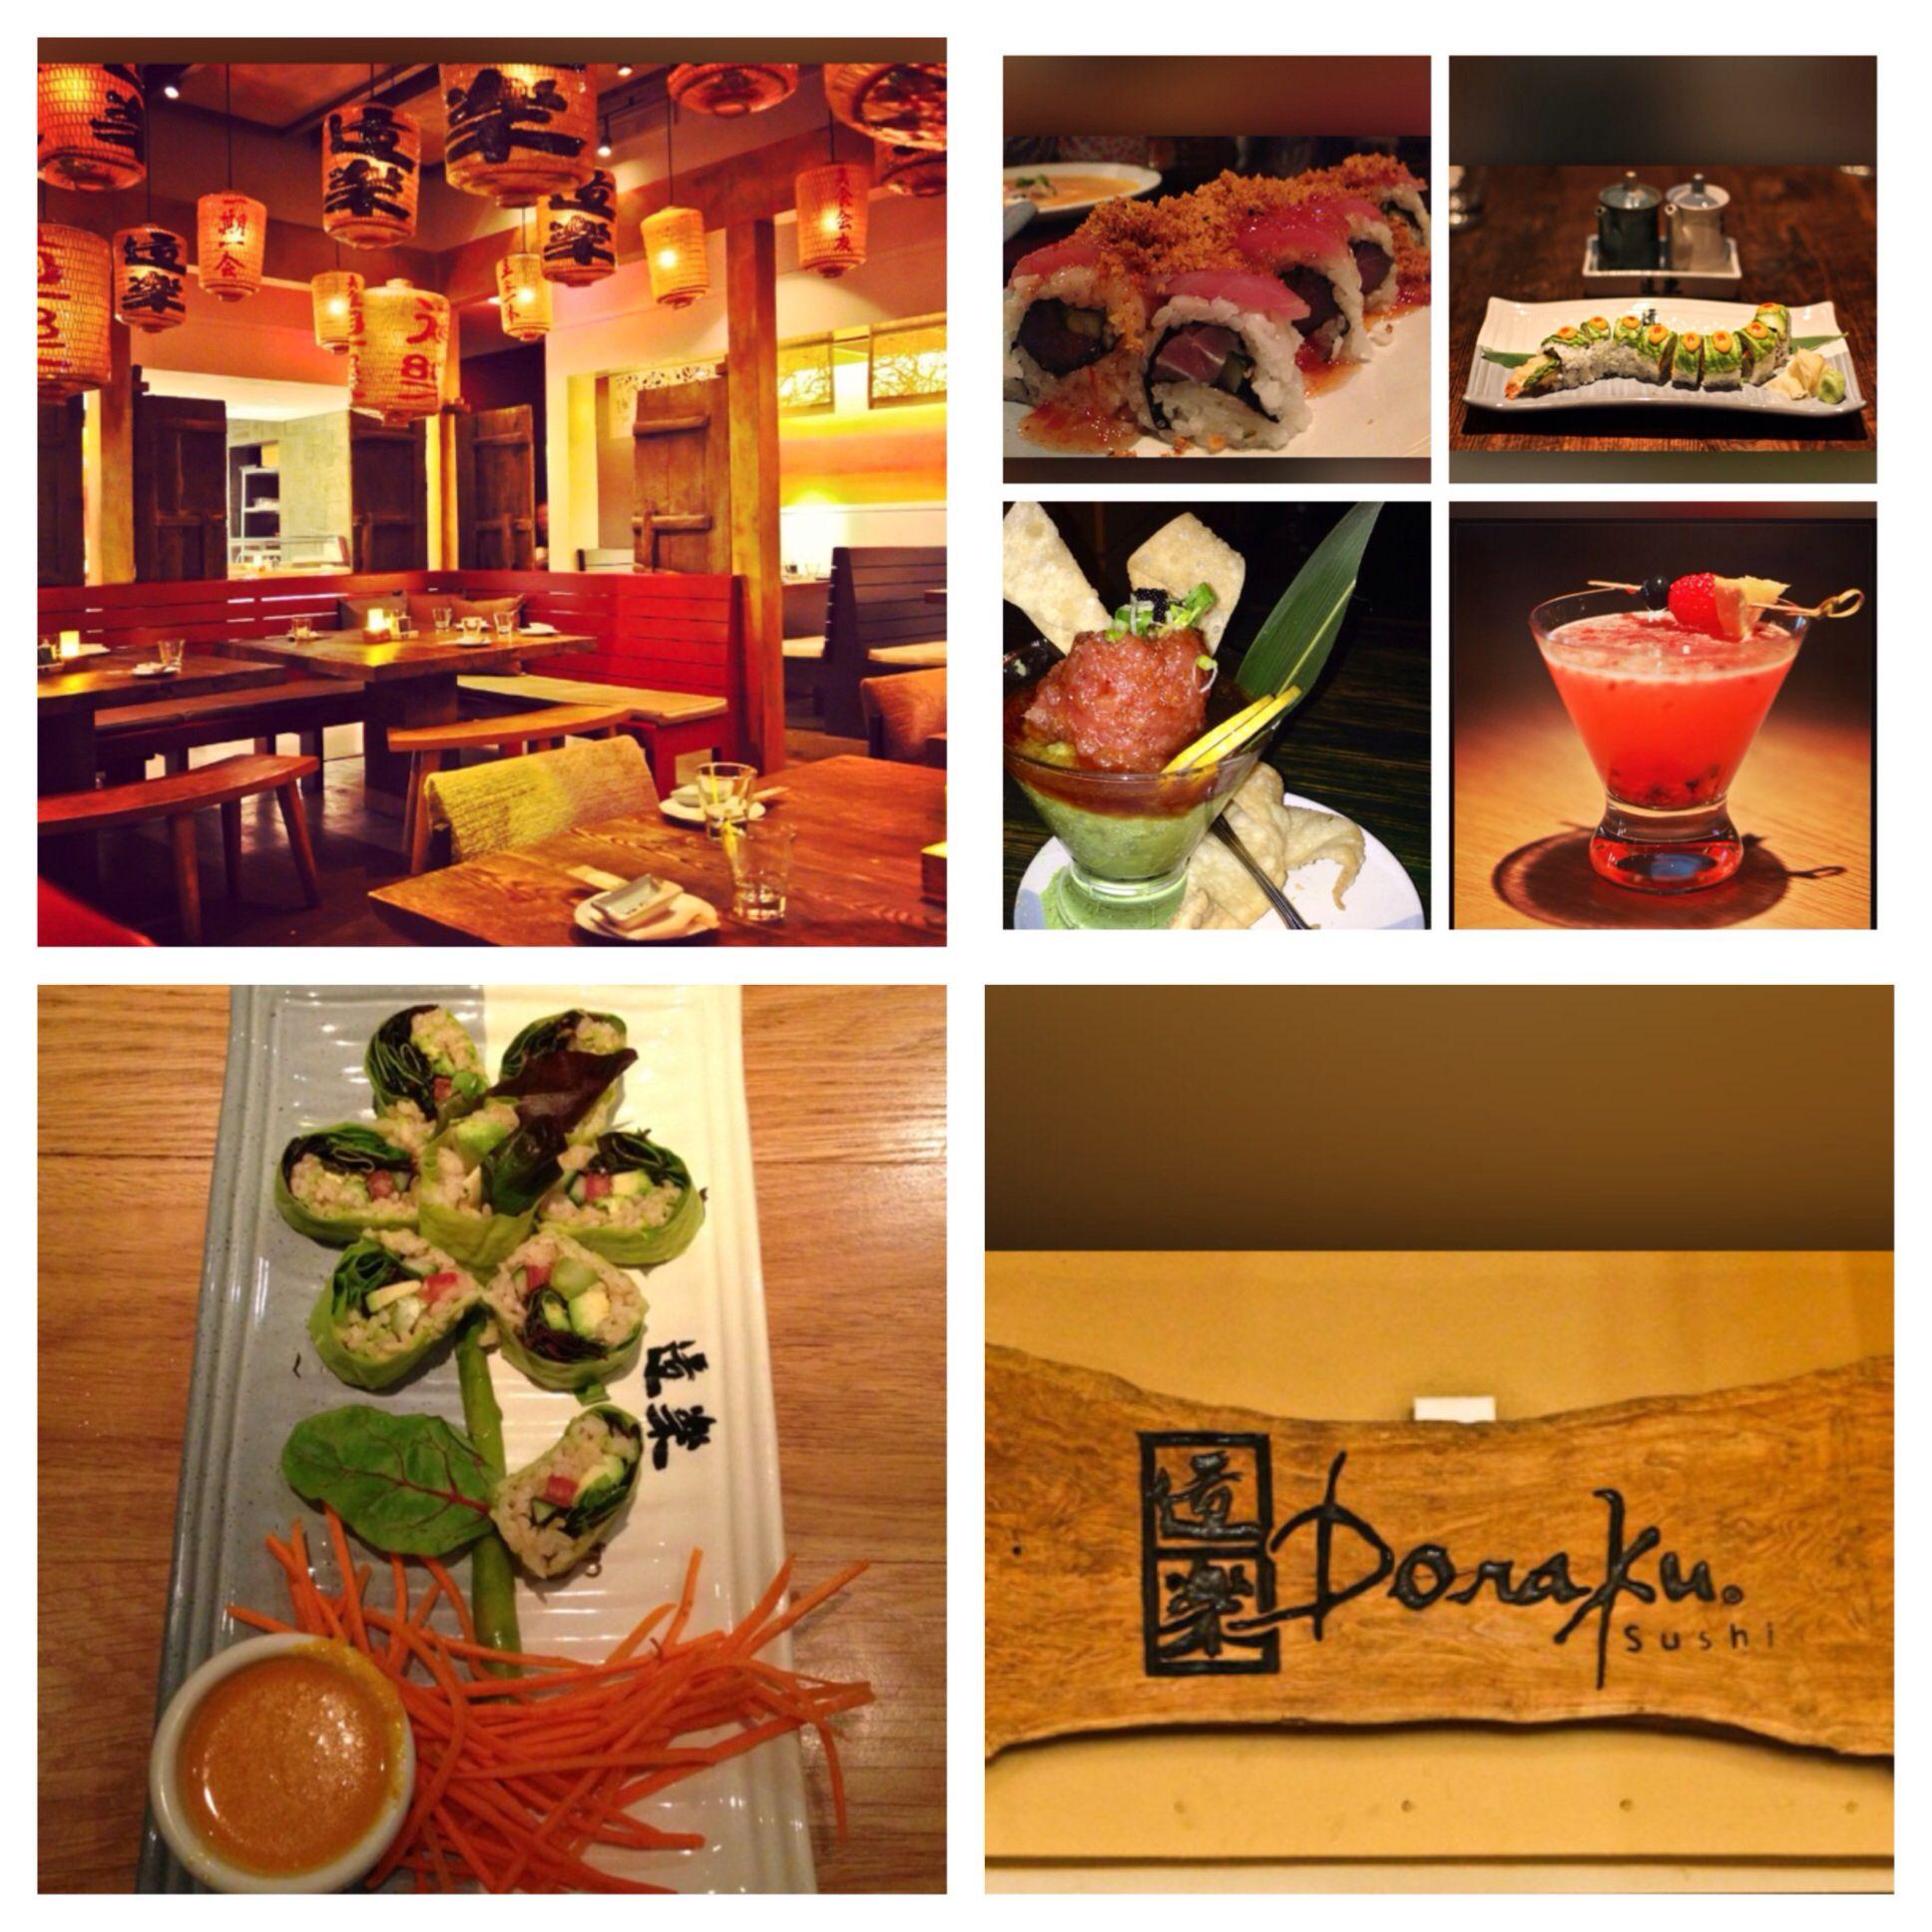 Doraku Sushi Restaurant @ Lincoln Mall